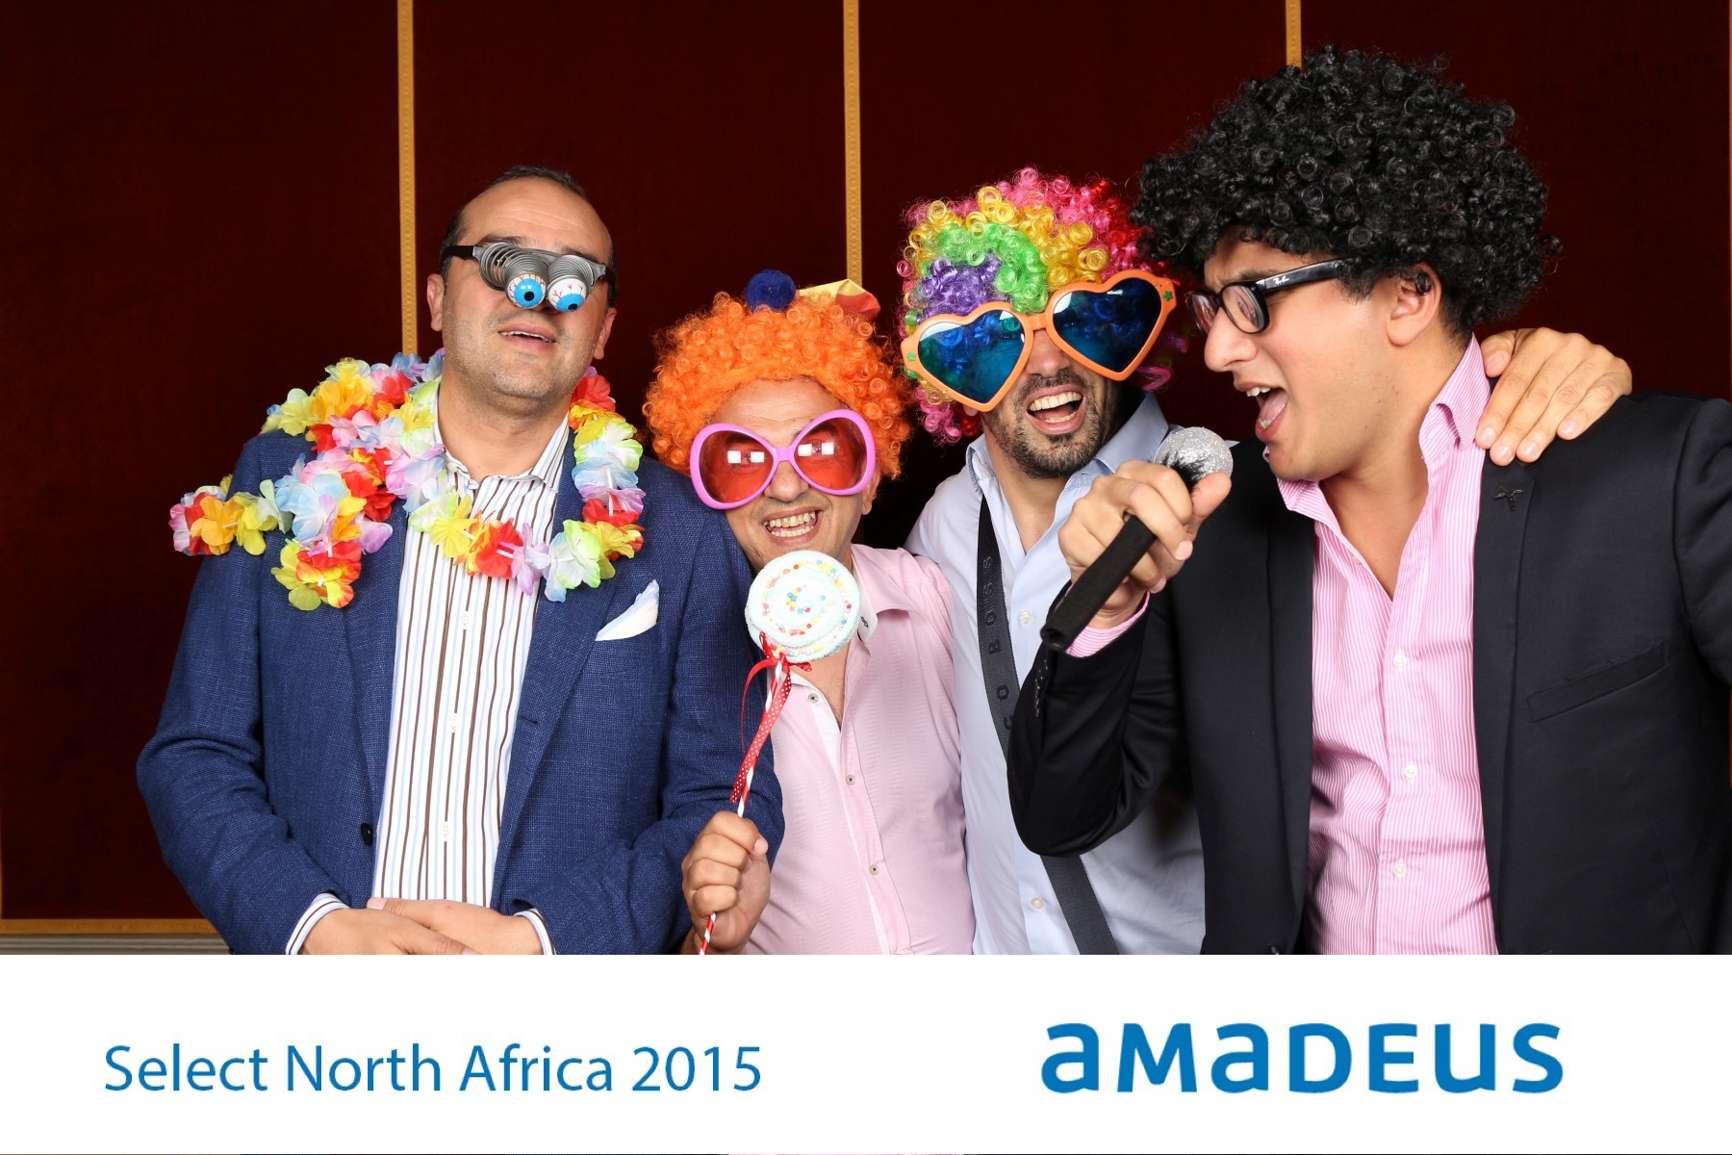 Fotobox für Amadeus